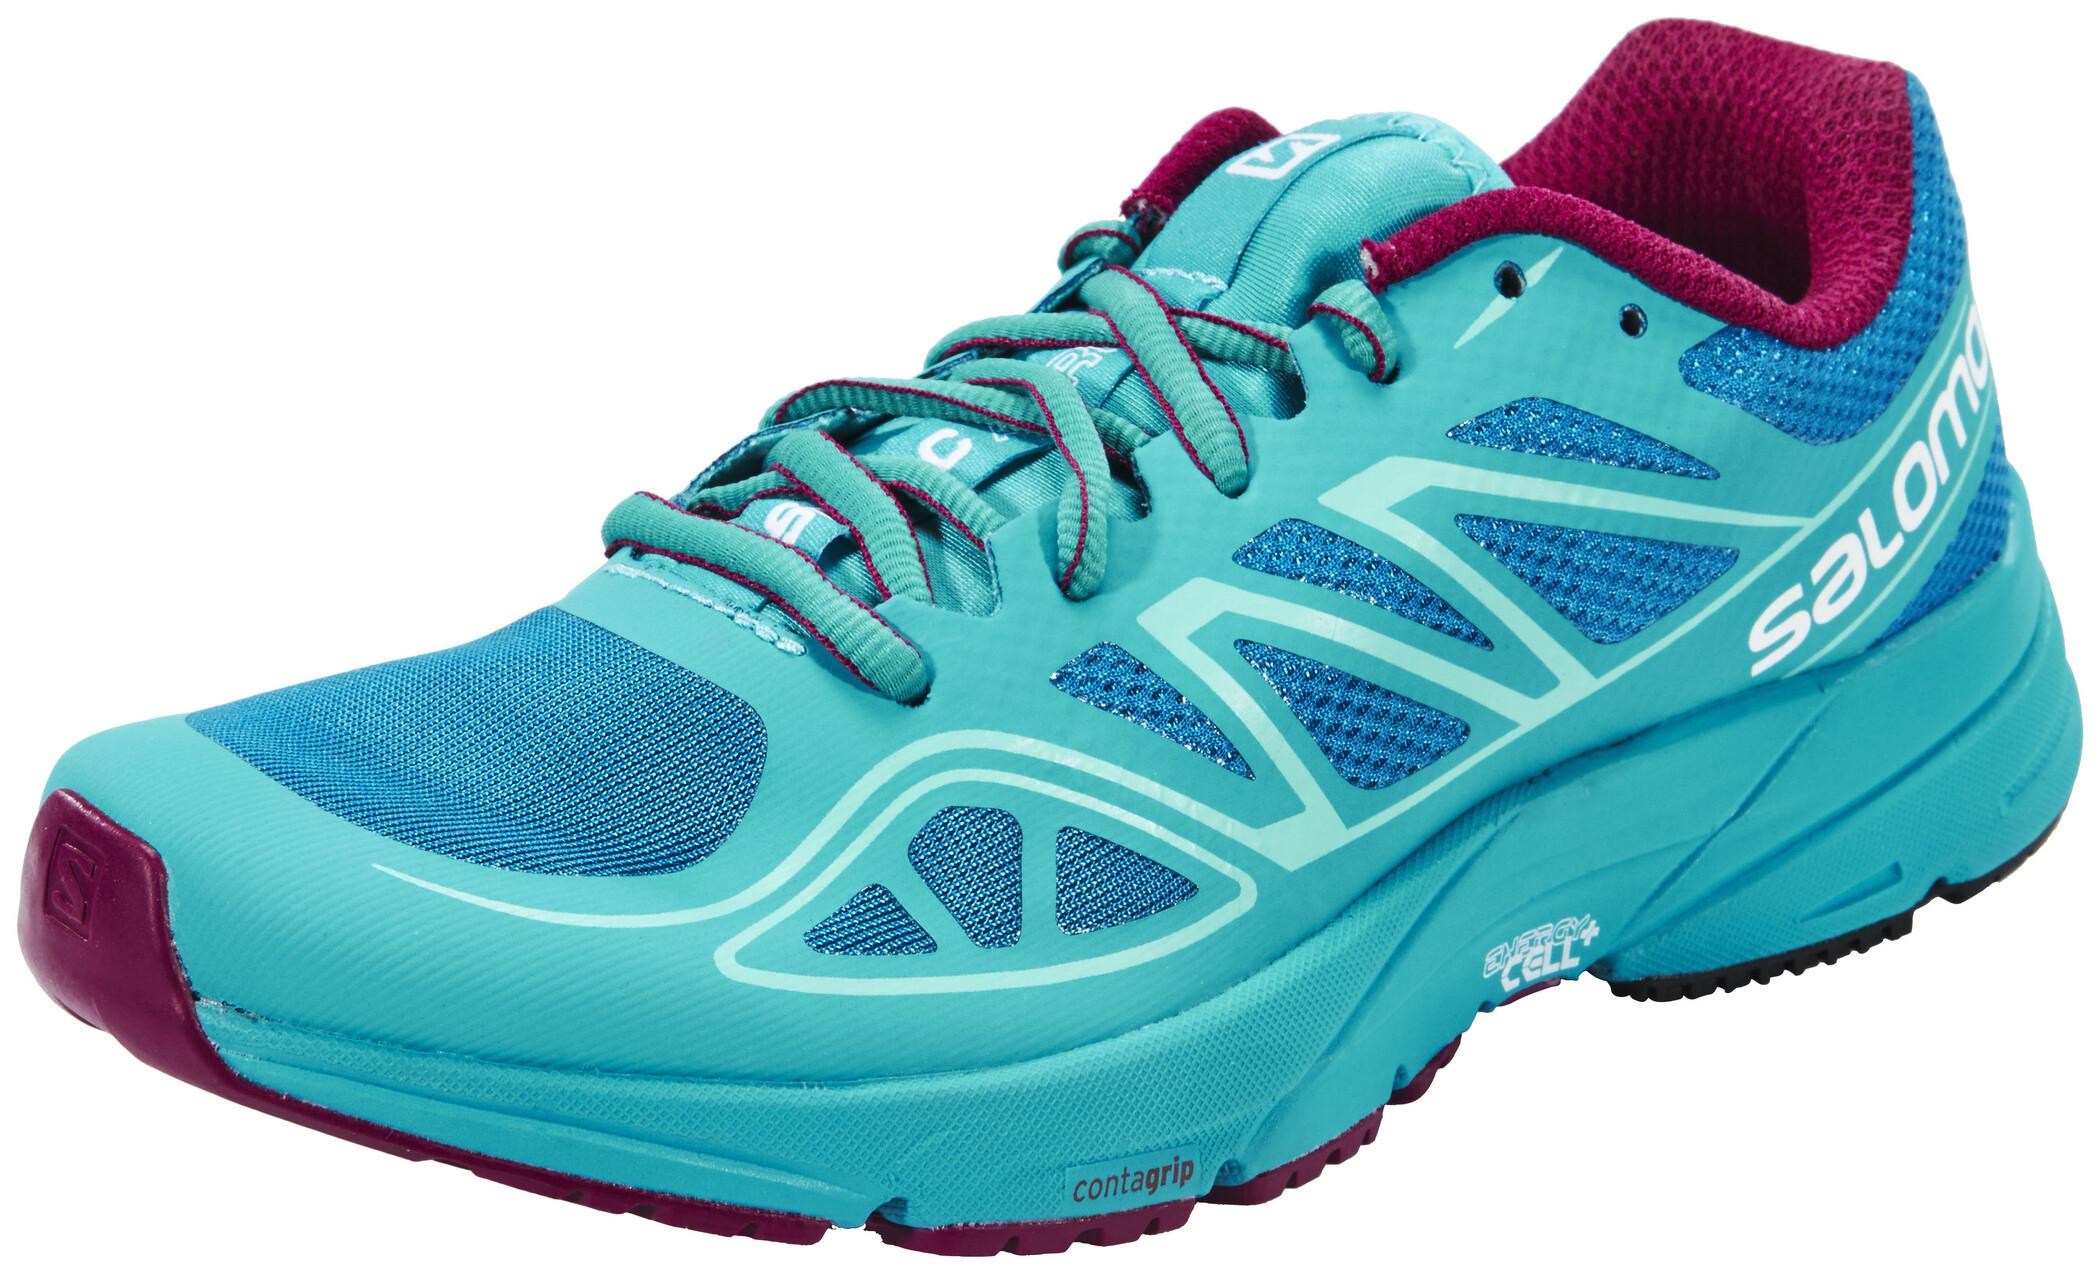 d0324f519a33 Salomon Sonic Aero Trailrunning Shoes Women fog blue teal blue f mystic purple .jpg